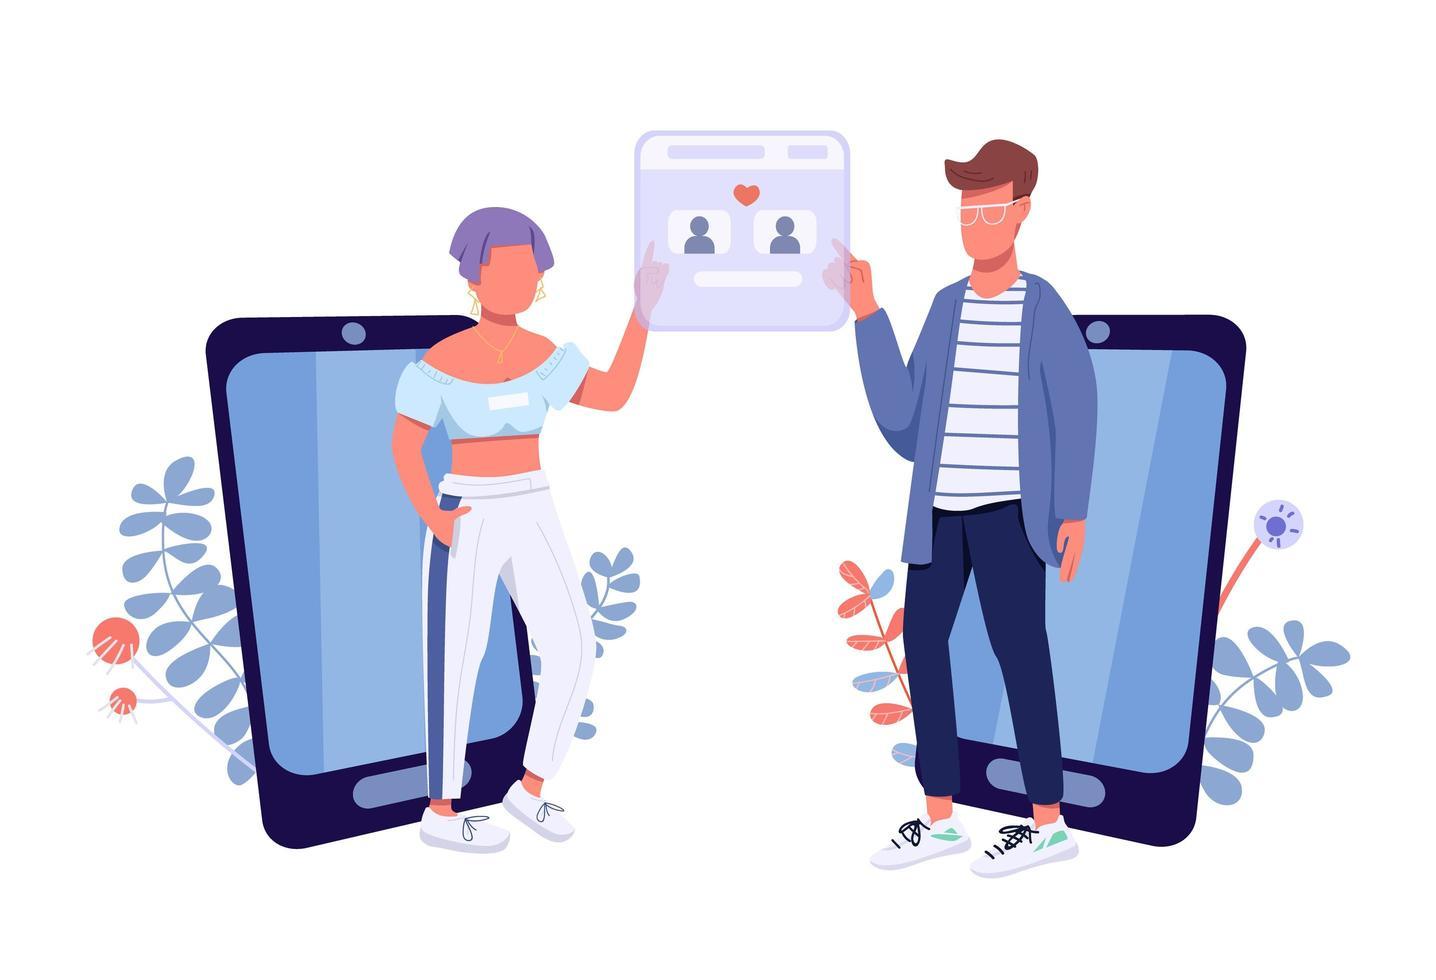 aplicación de citas online vector